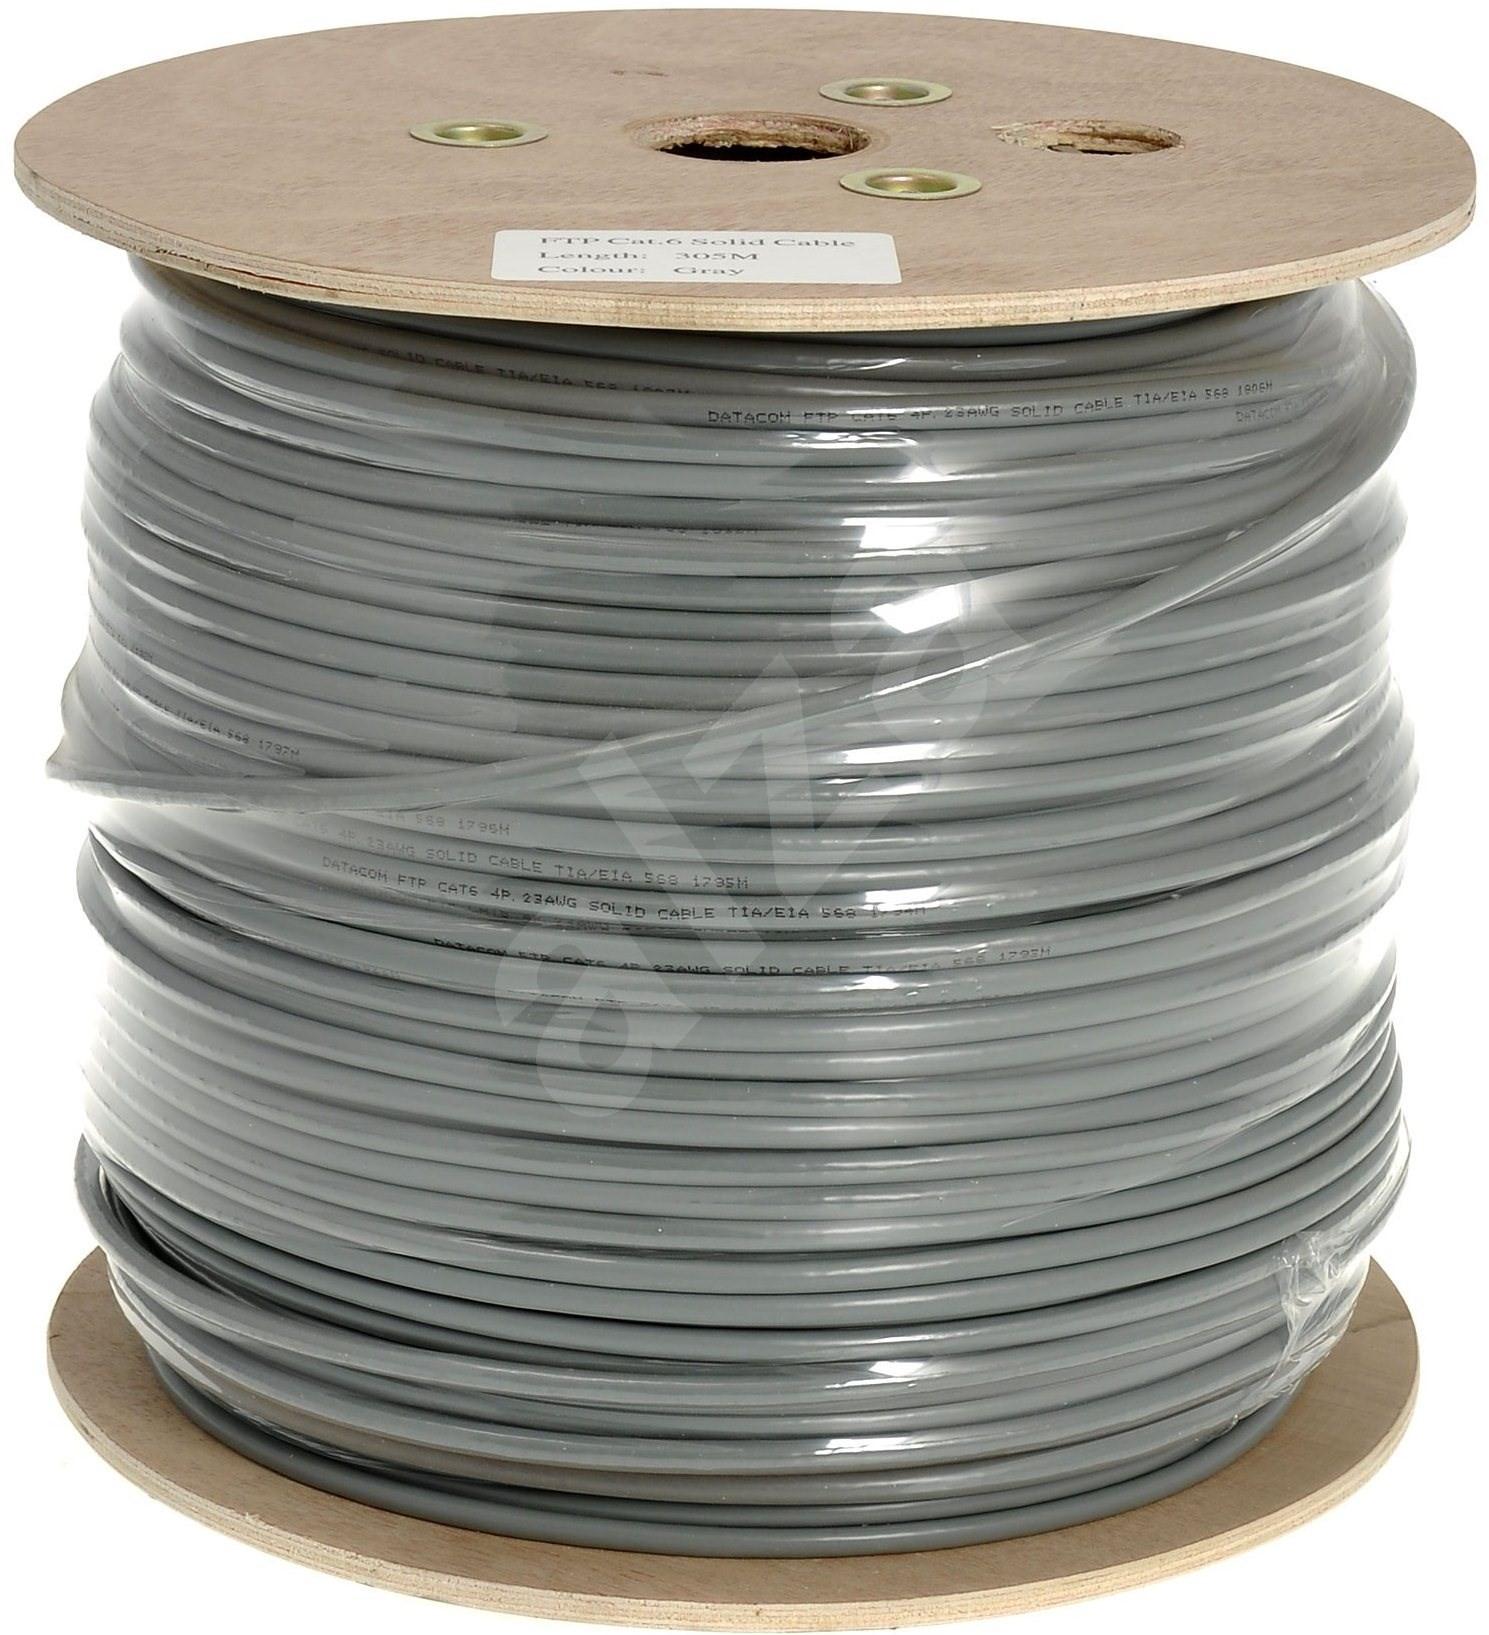 Pvc Coil Cable : Datacom wire cat e sftp pvc m coil network